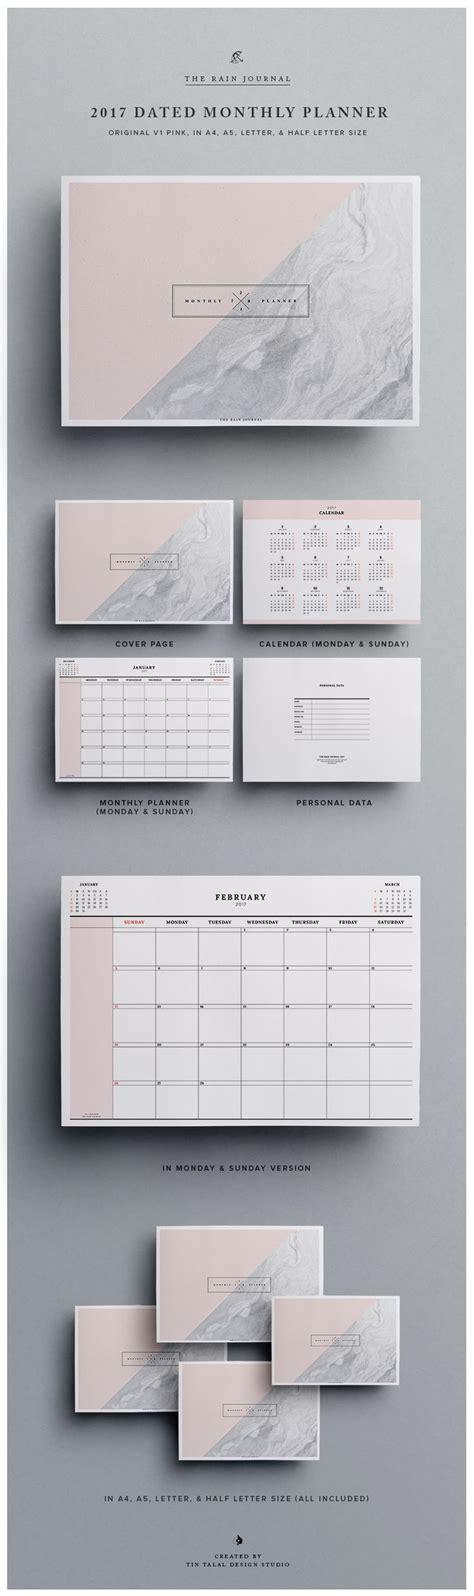 desk calendars ideas pinterest desk calender